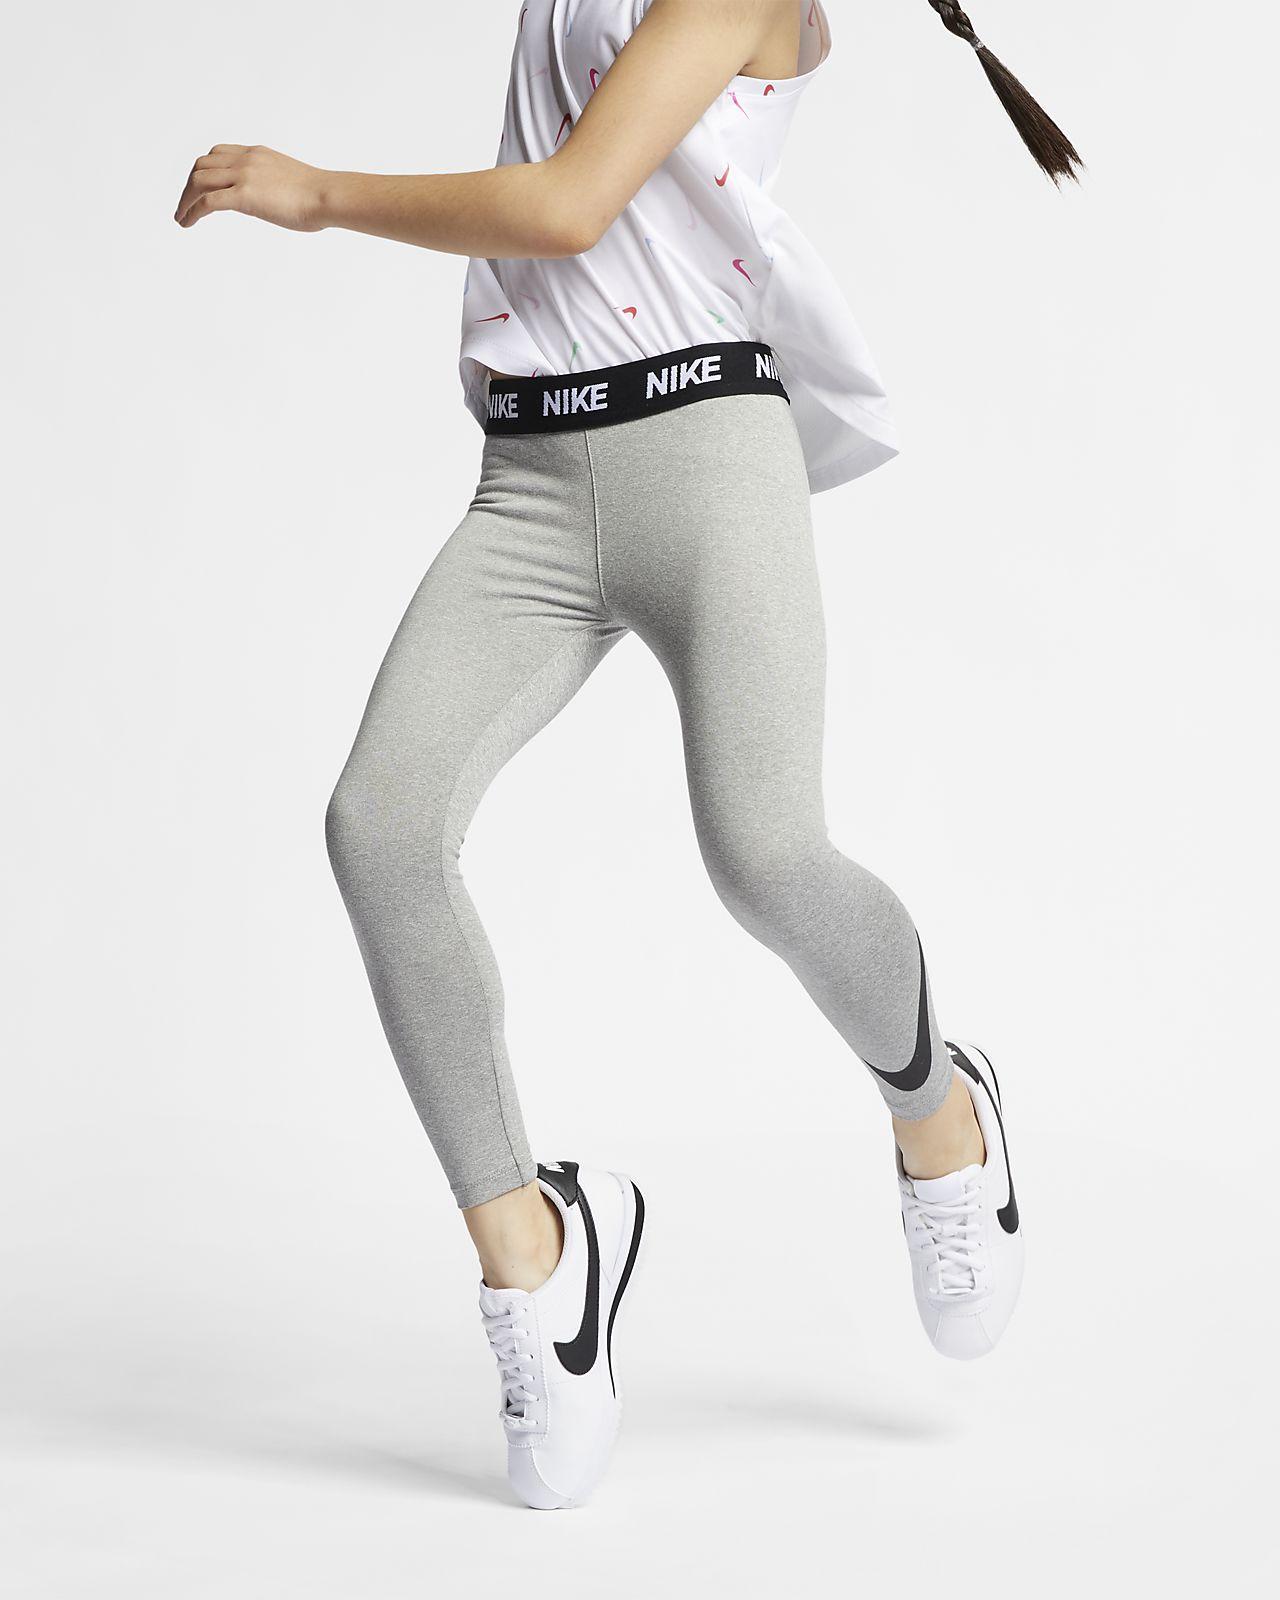 It Leggings Essential Sportswear Nike Bambini q6ZOwA